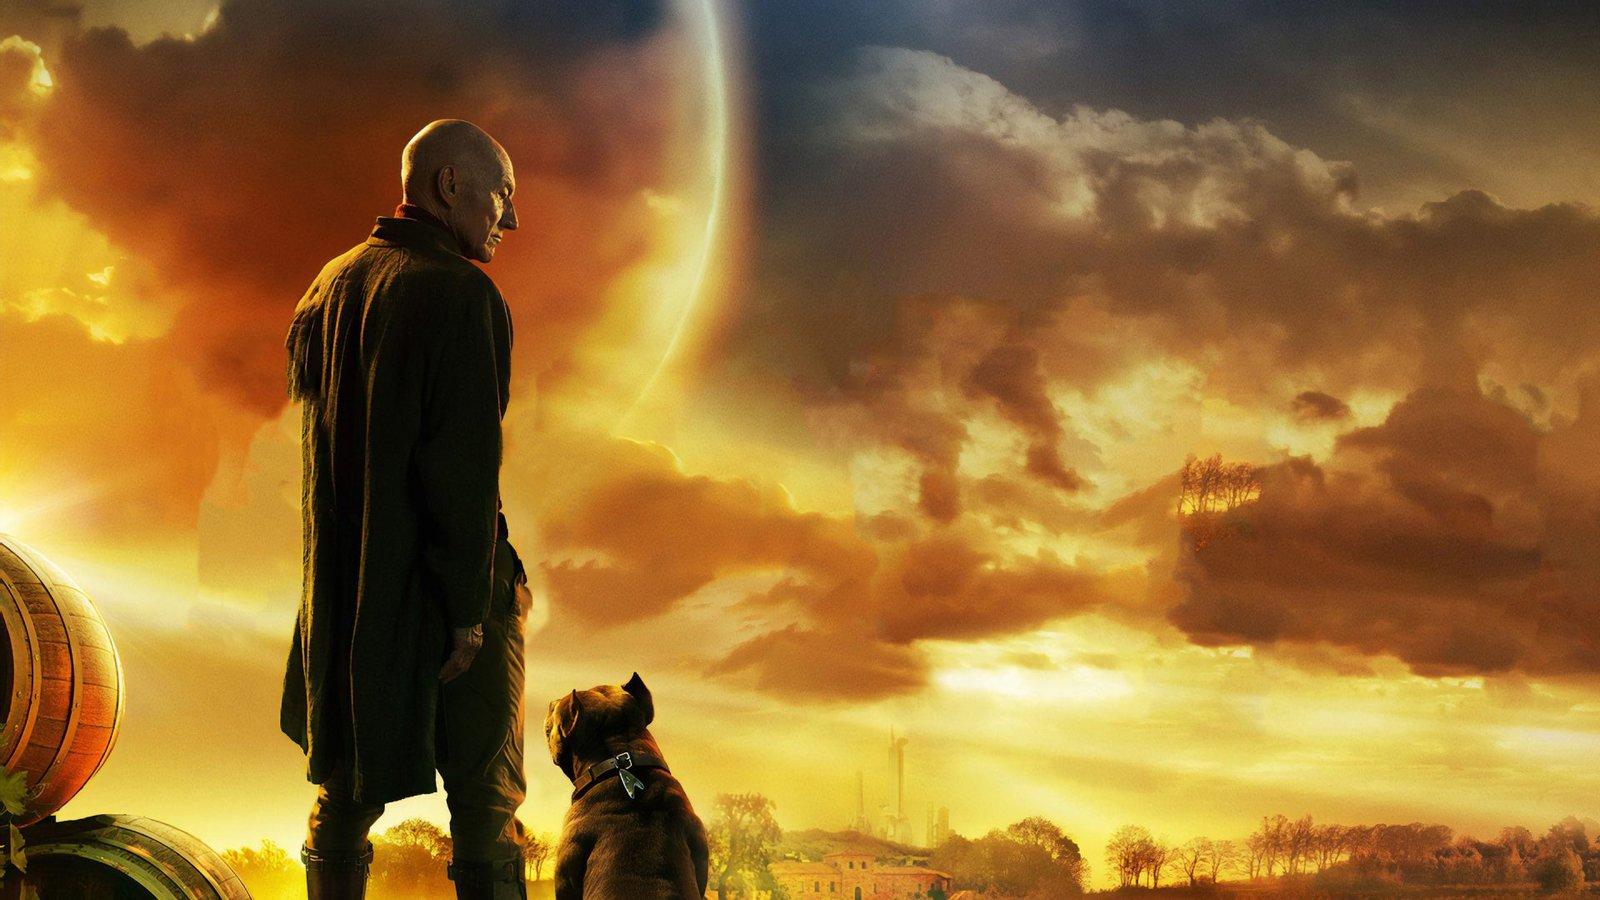 Звёздный путь: Пикар / Star Trek: Picard background